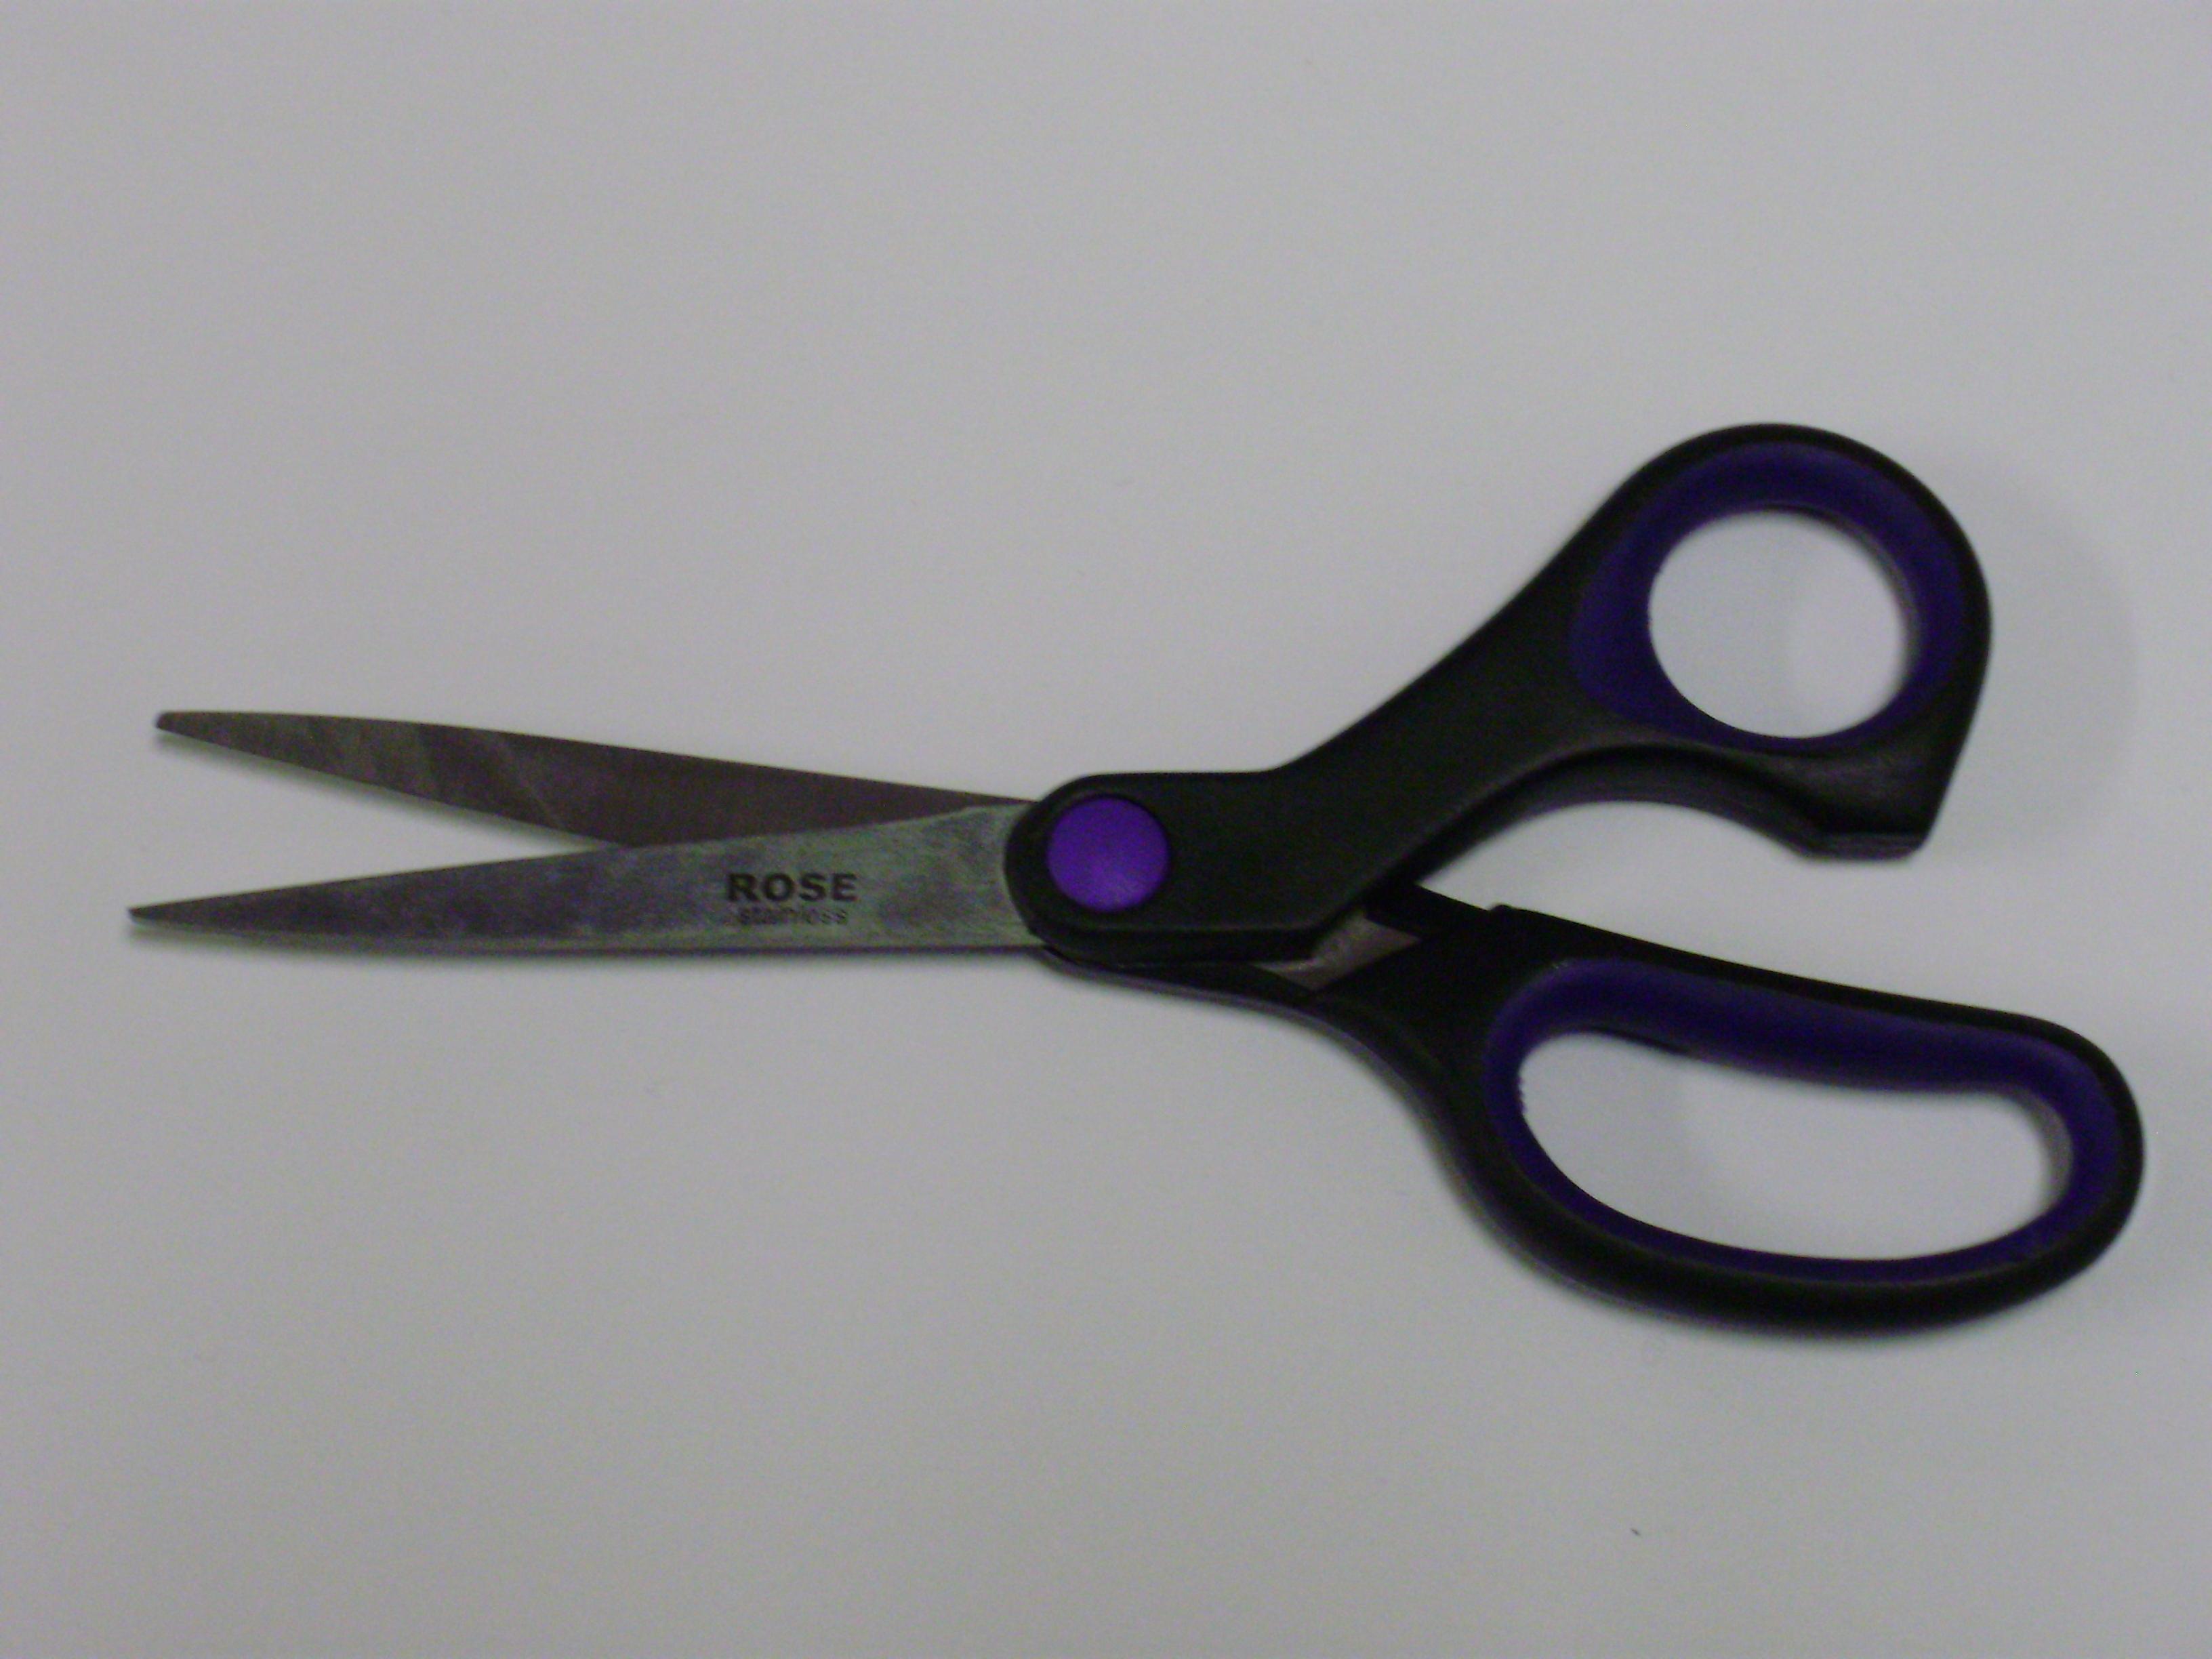 "Scissors School Source Soft Grip - 6.75"" - Each"